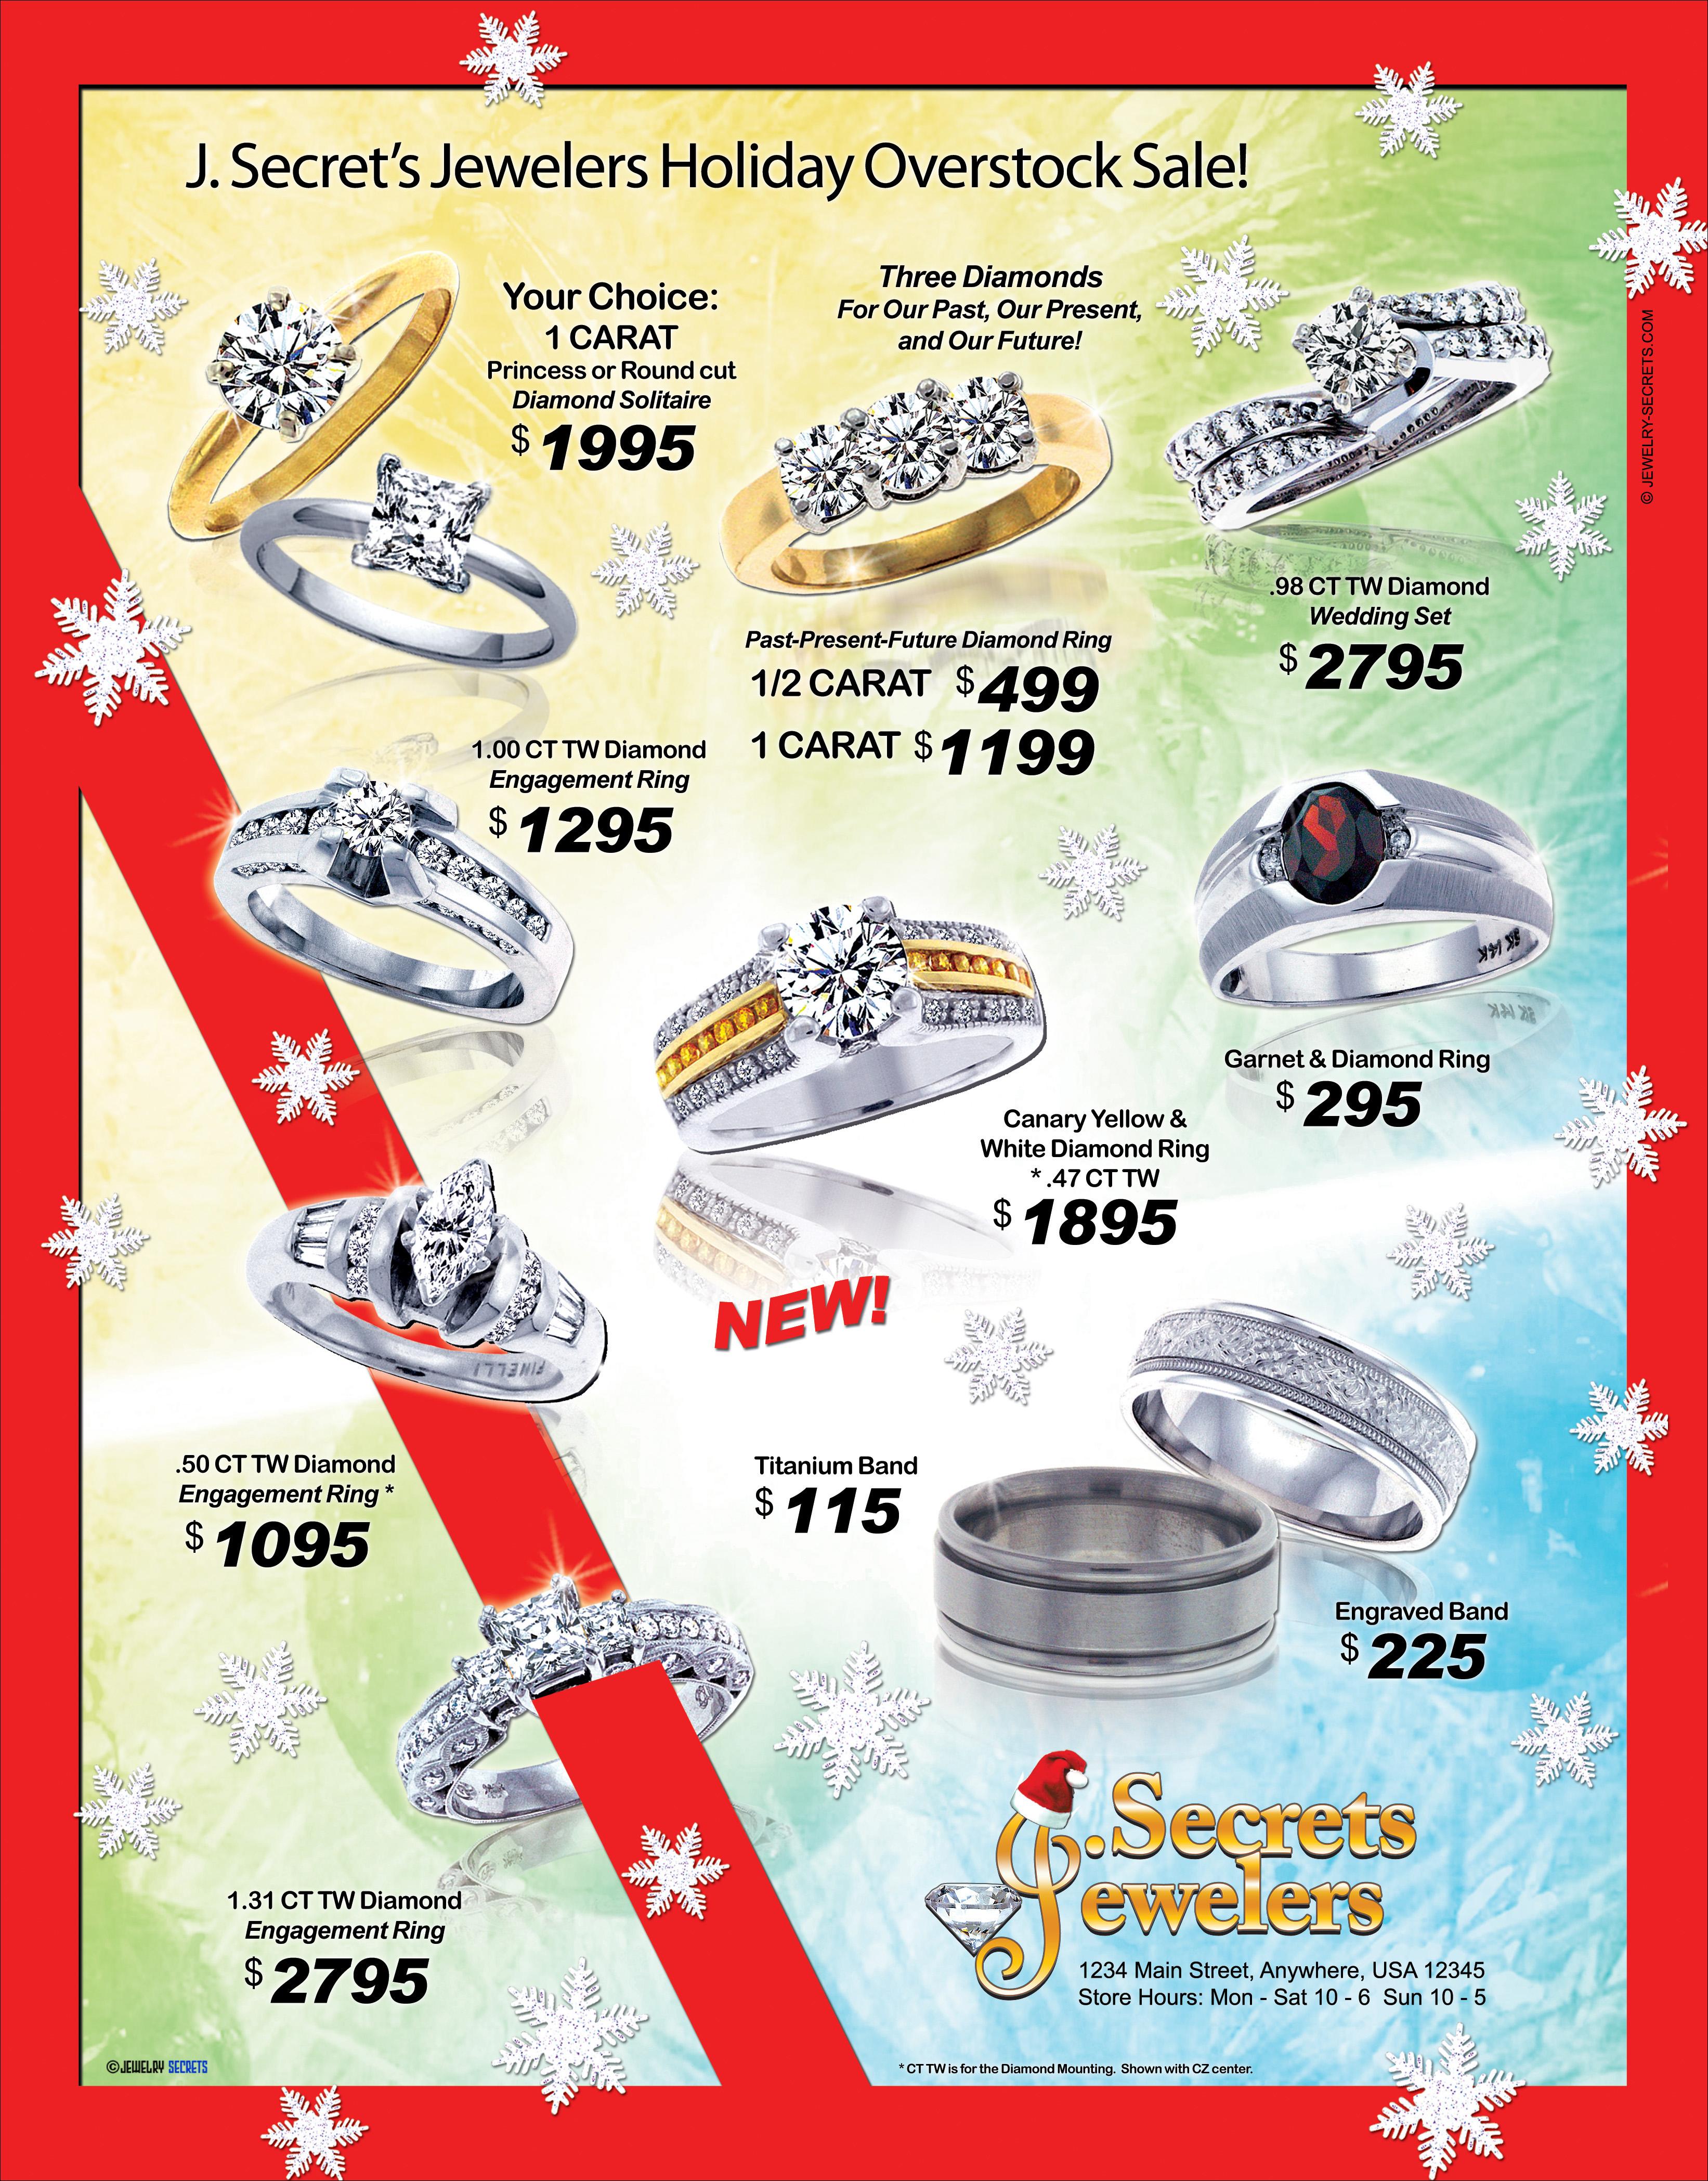 JEWELER'S HOLIDAY OVERSTOCK SALE SAMPLE ADVERTISEMENT – Jewelry ...